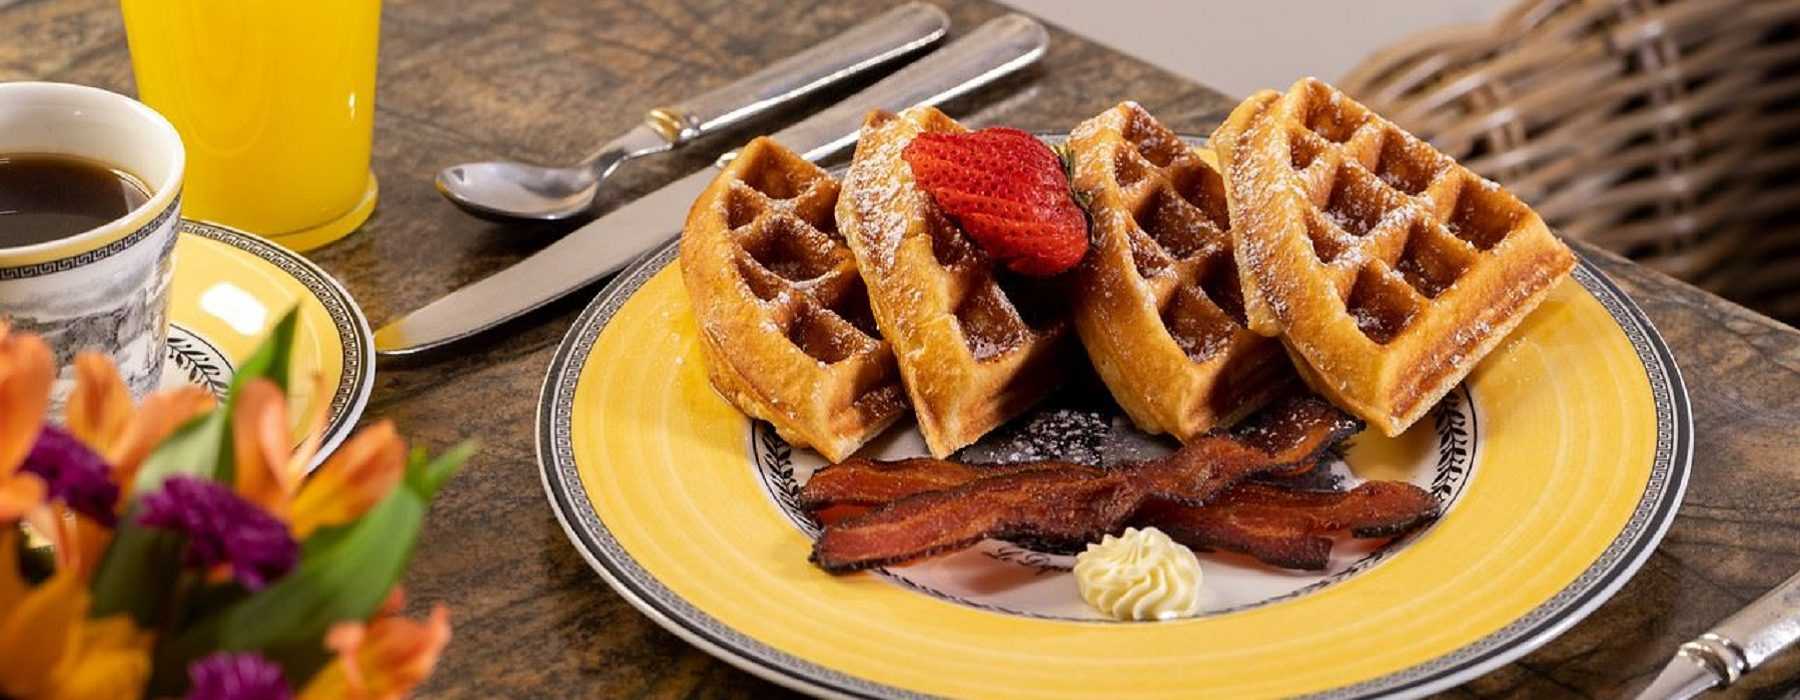 Waffles - Hero